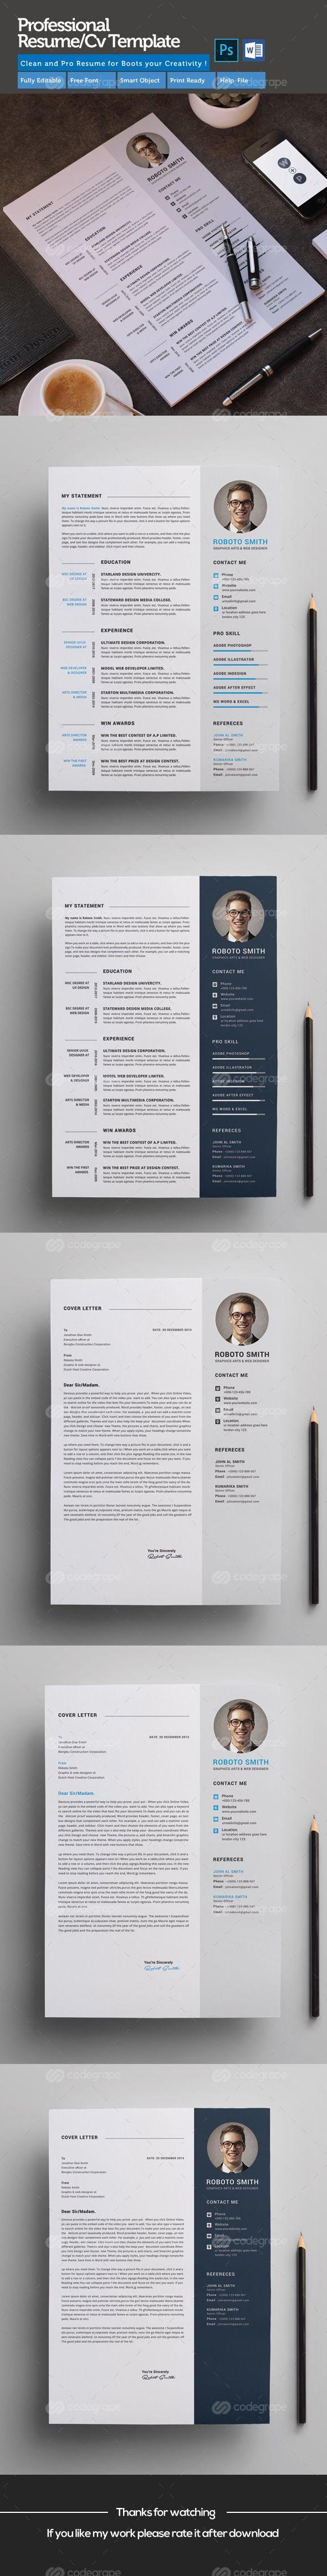 Resume Cover Letter 19 best Stationery